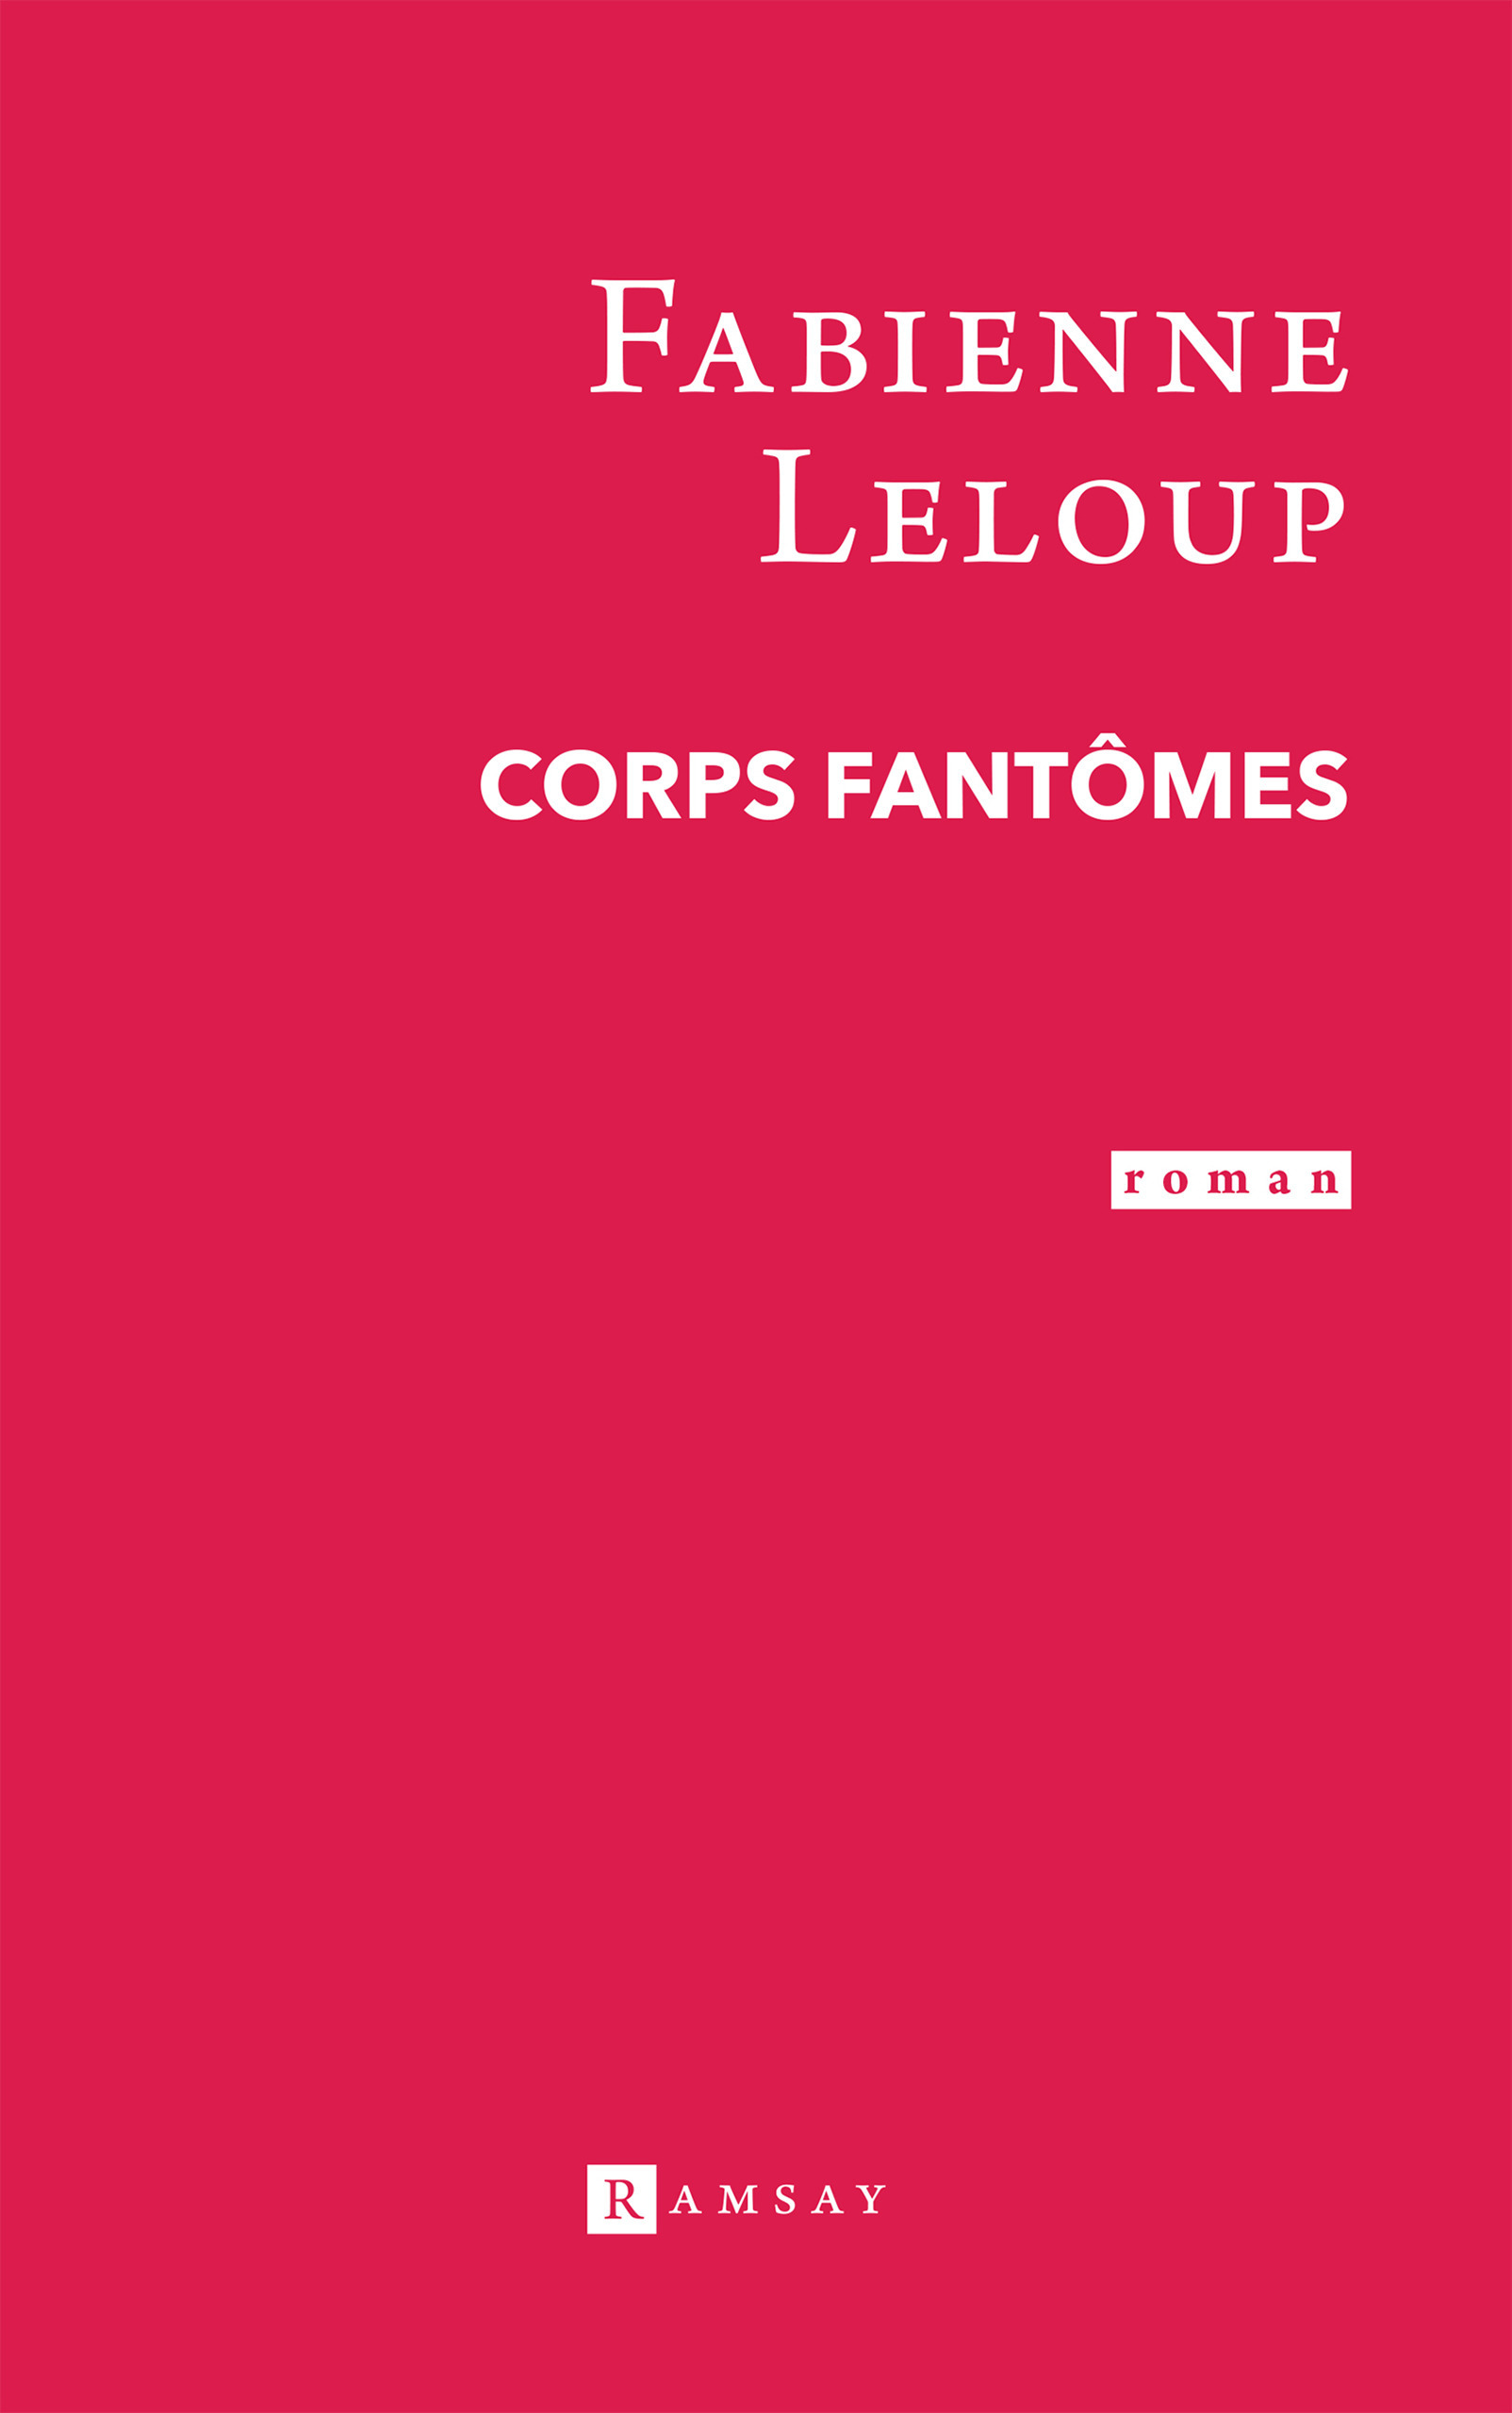 Corps fantomes